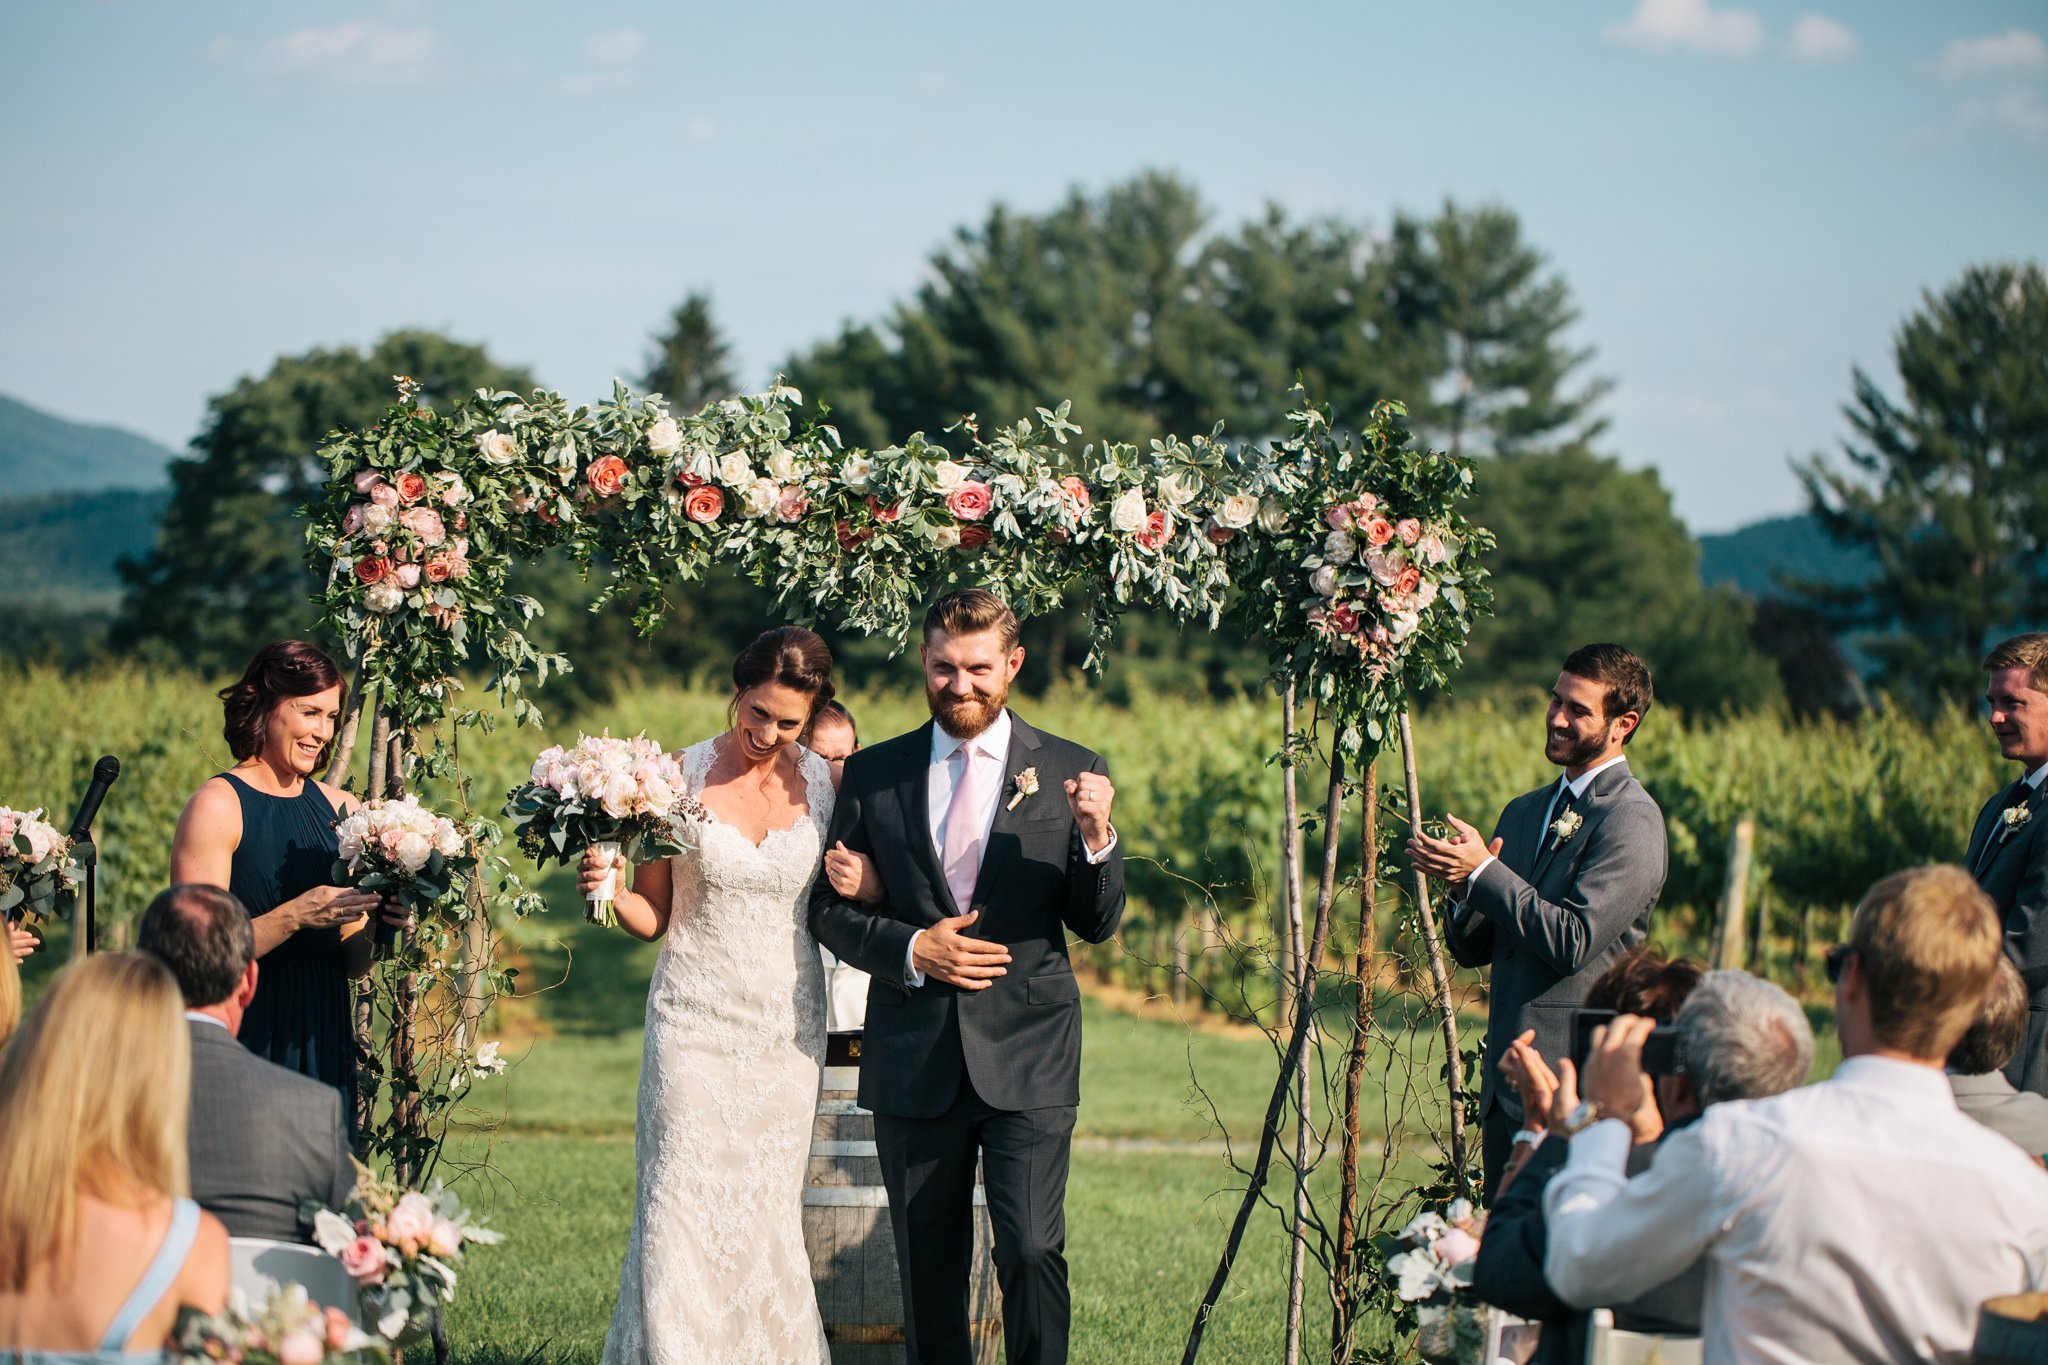 Veritas-Wedding-Photographer_010.jpg